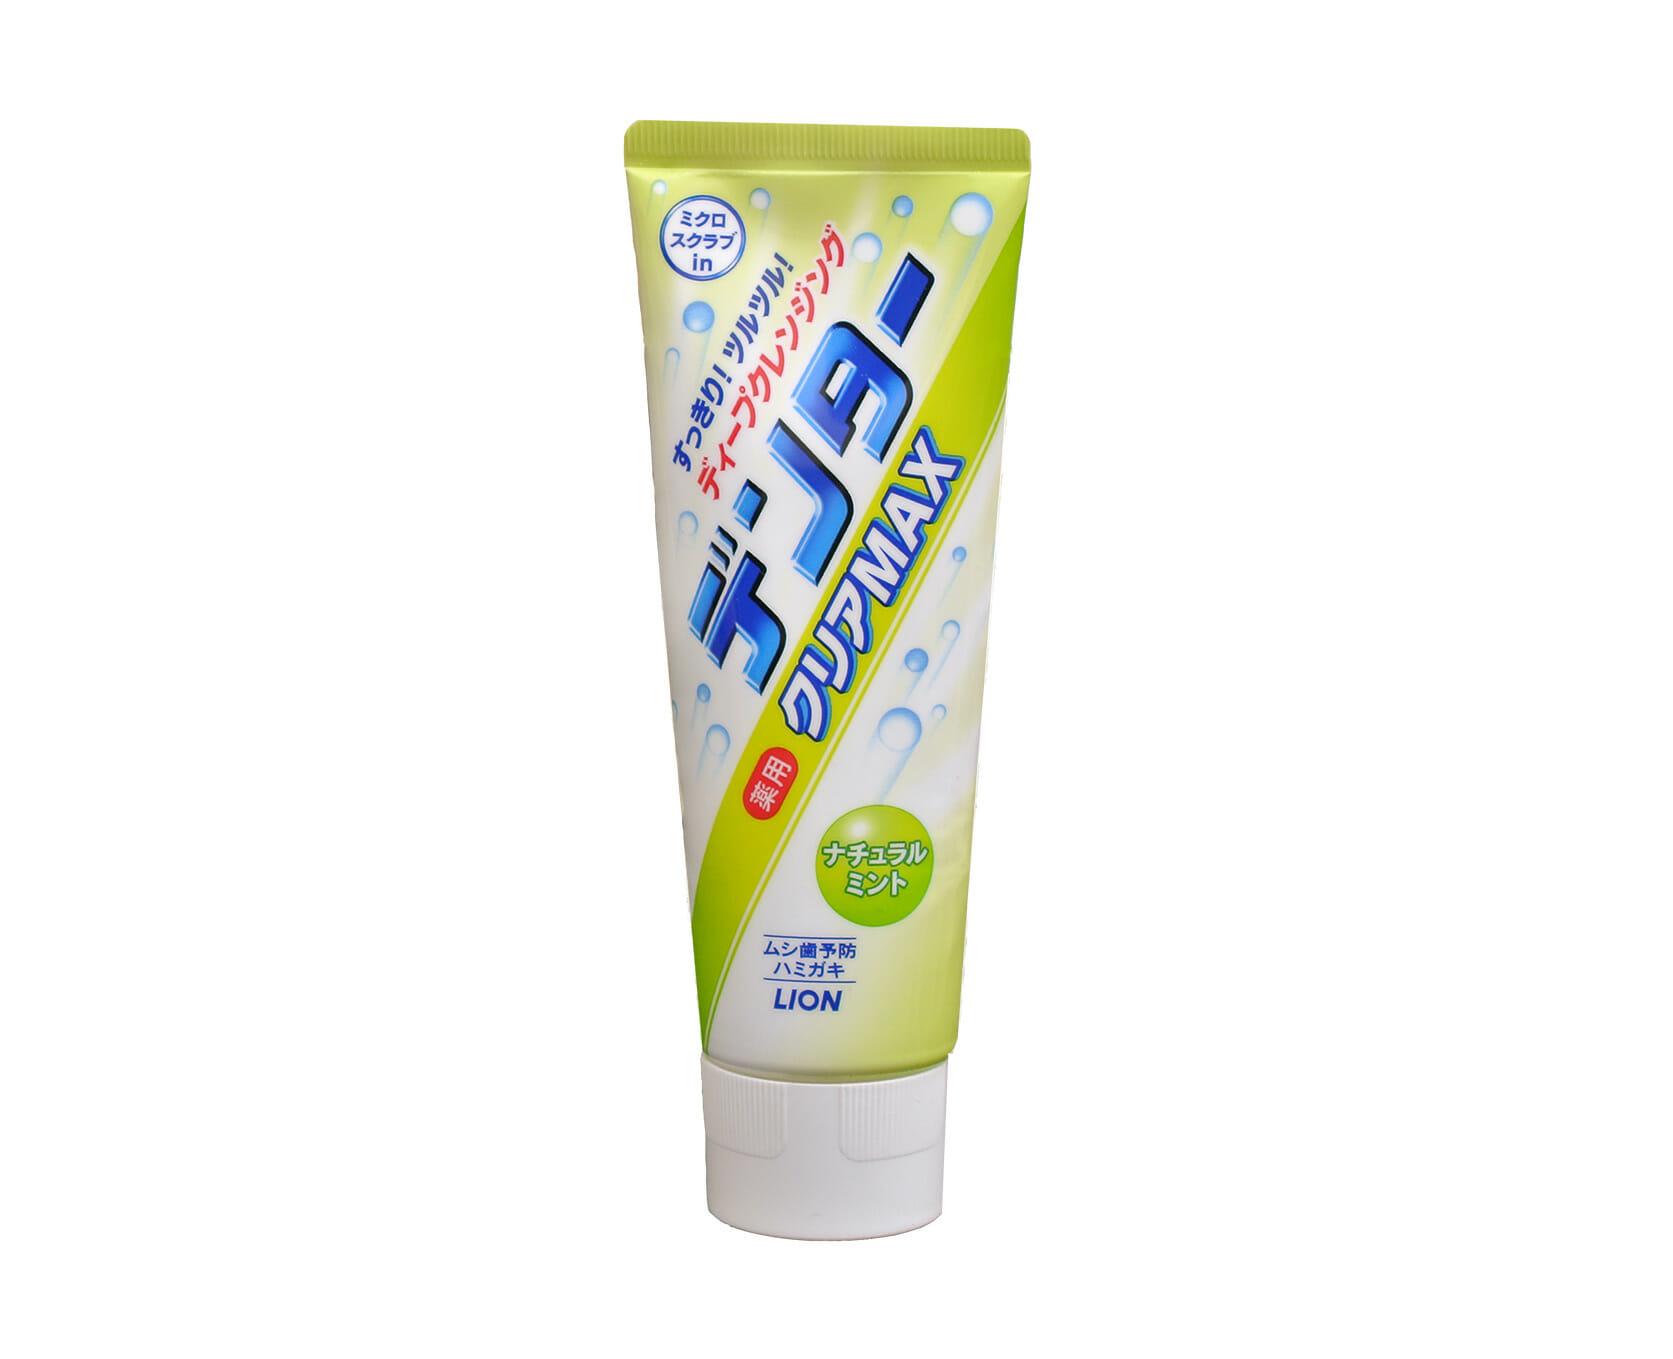 Dentor Clear MAXб зубная паста Dentor Clear MAX